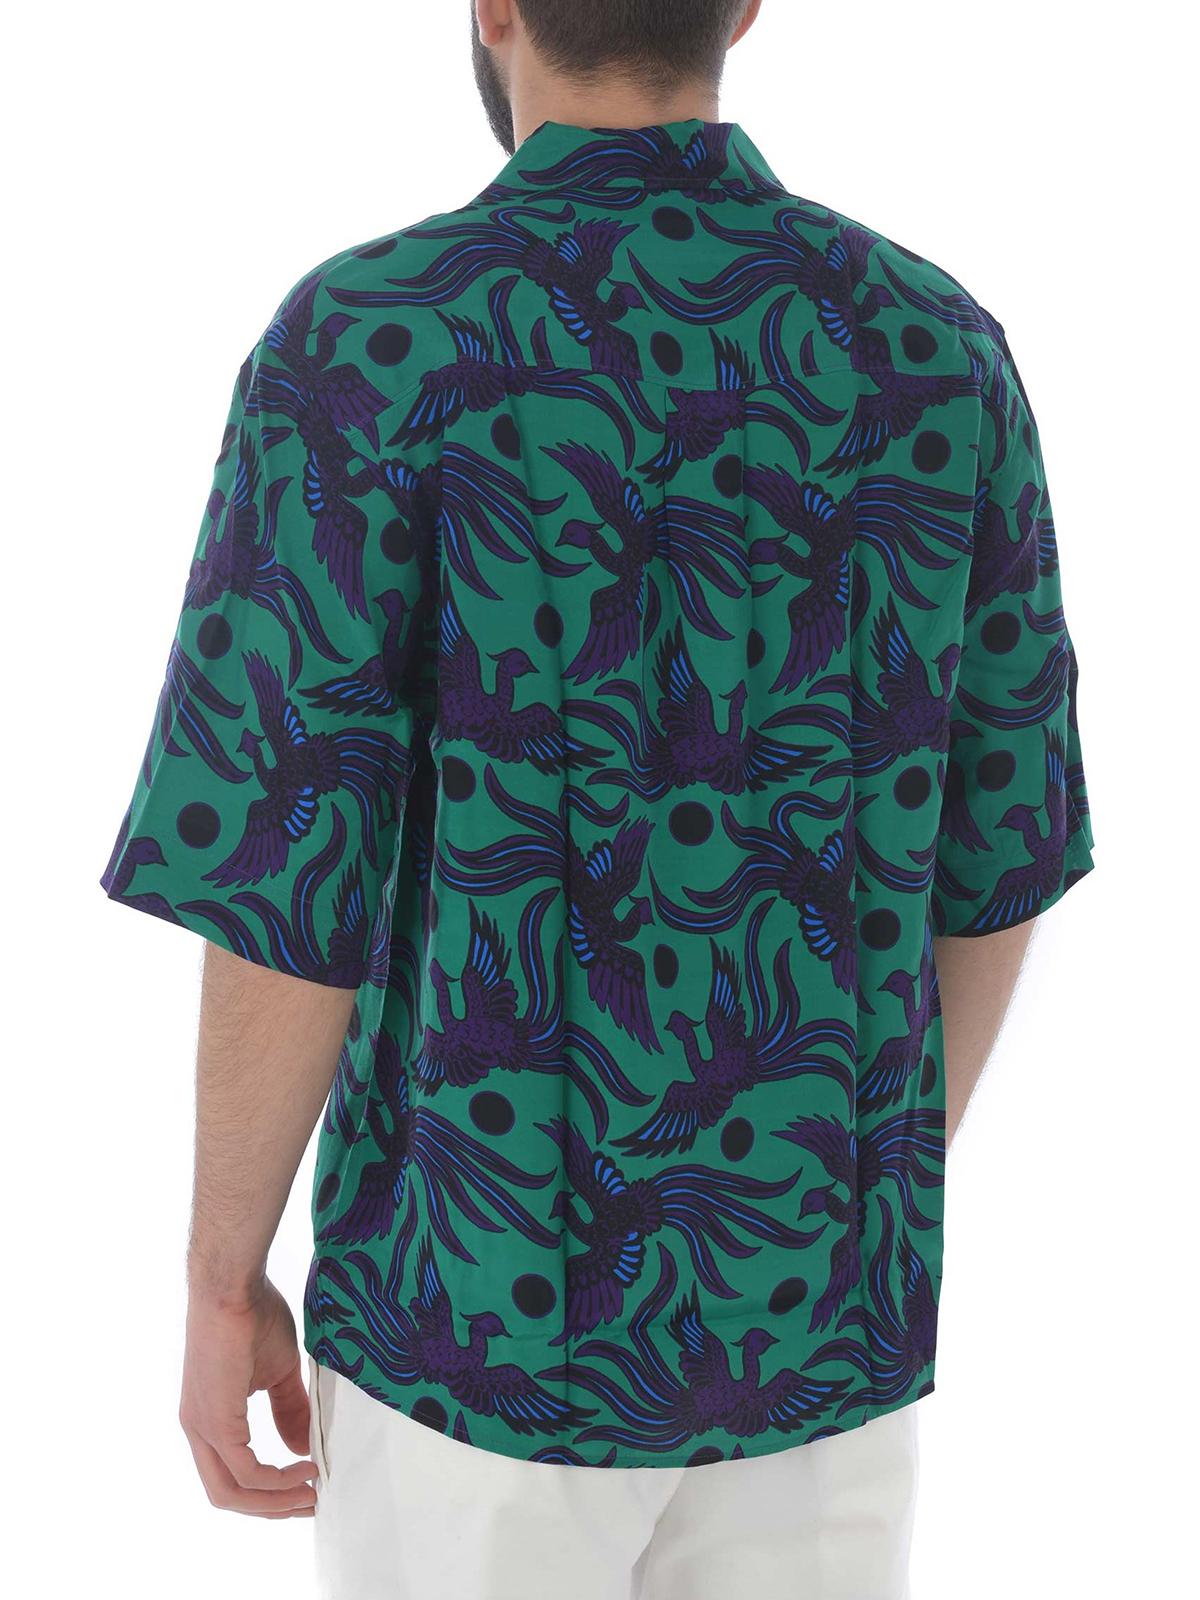 6a25d7e0 Kenzo - Flying Phoenix hawaiian shirt - shirts - F955CH5281KB 57